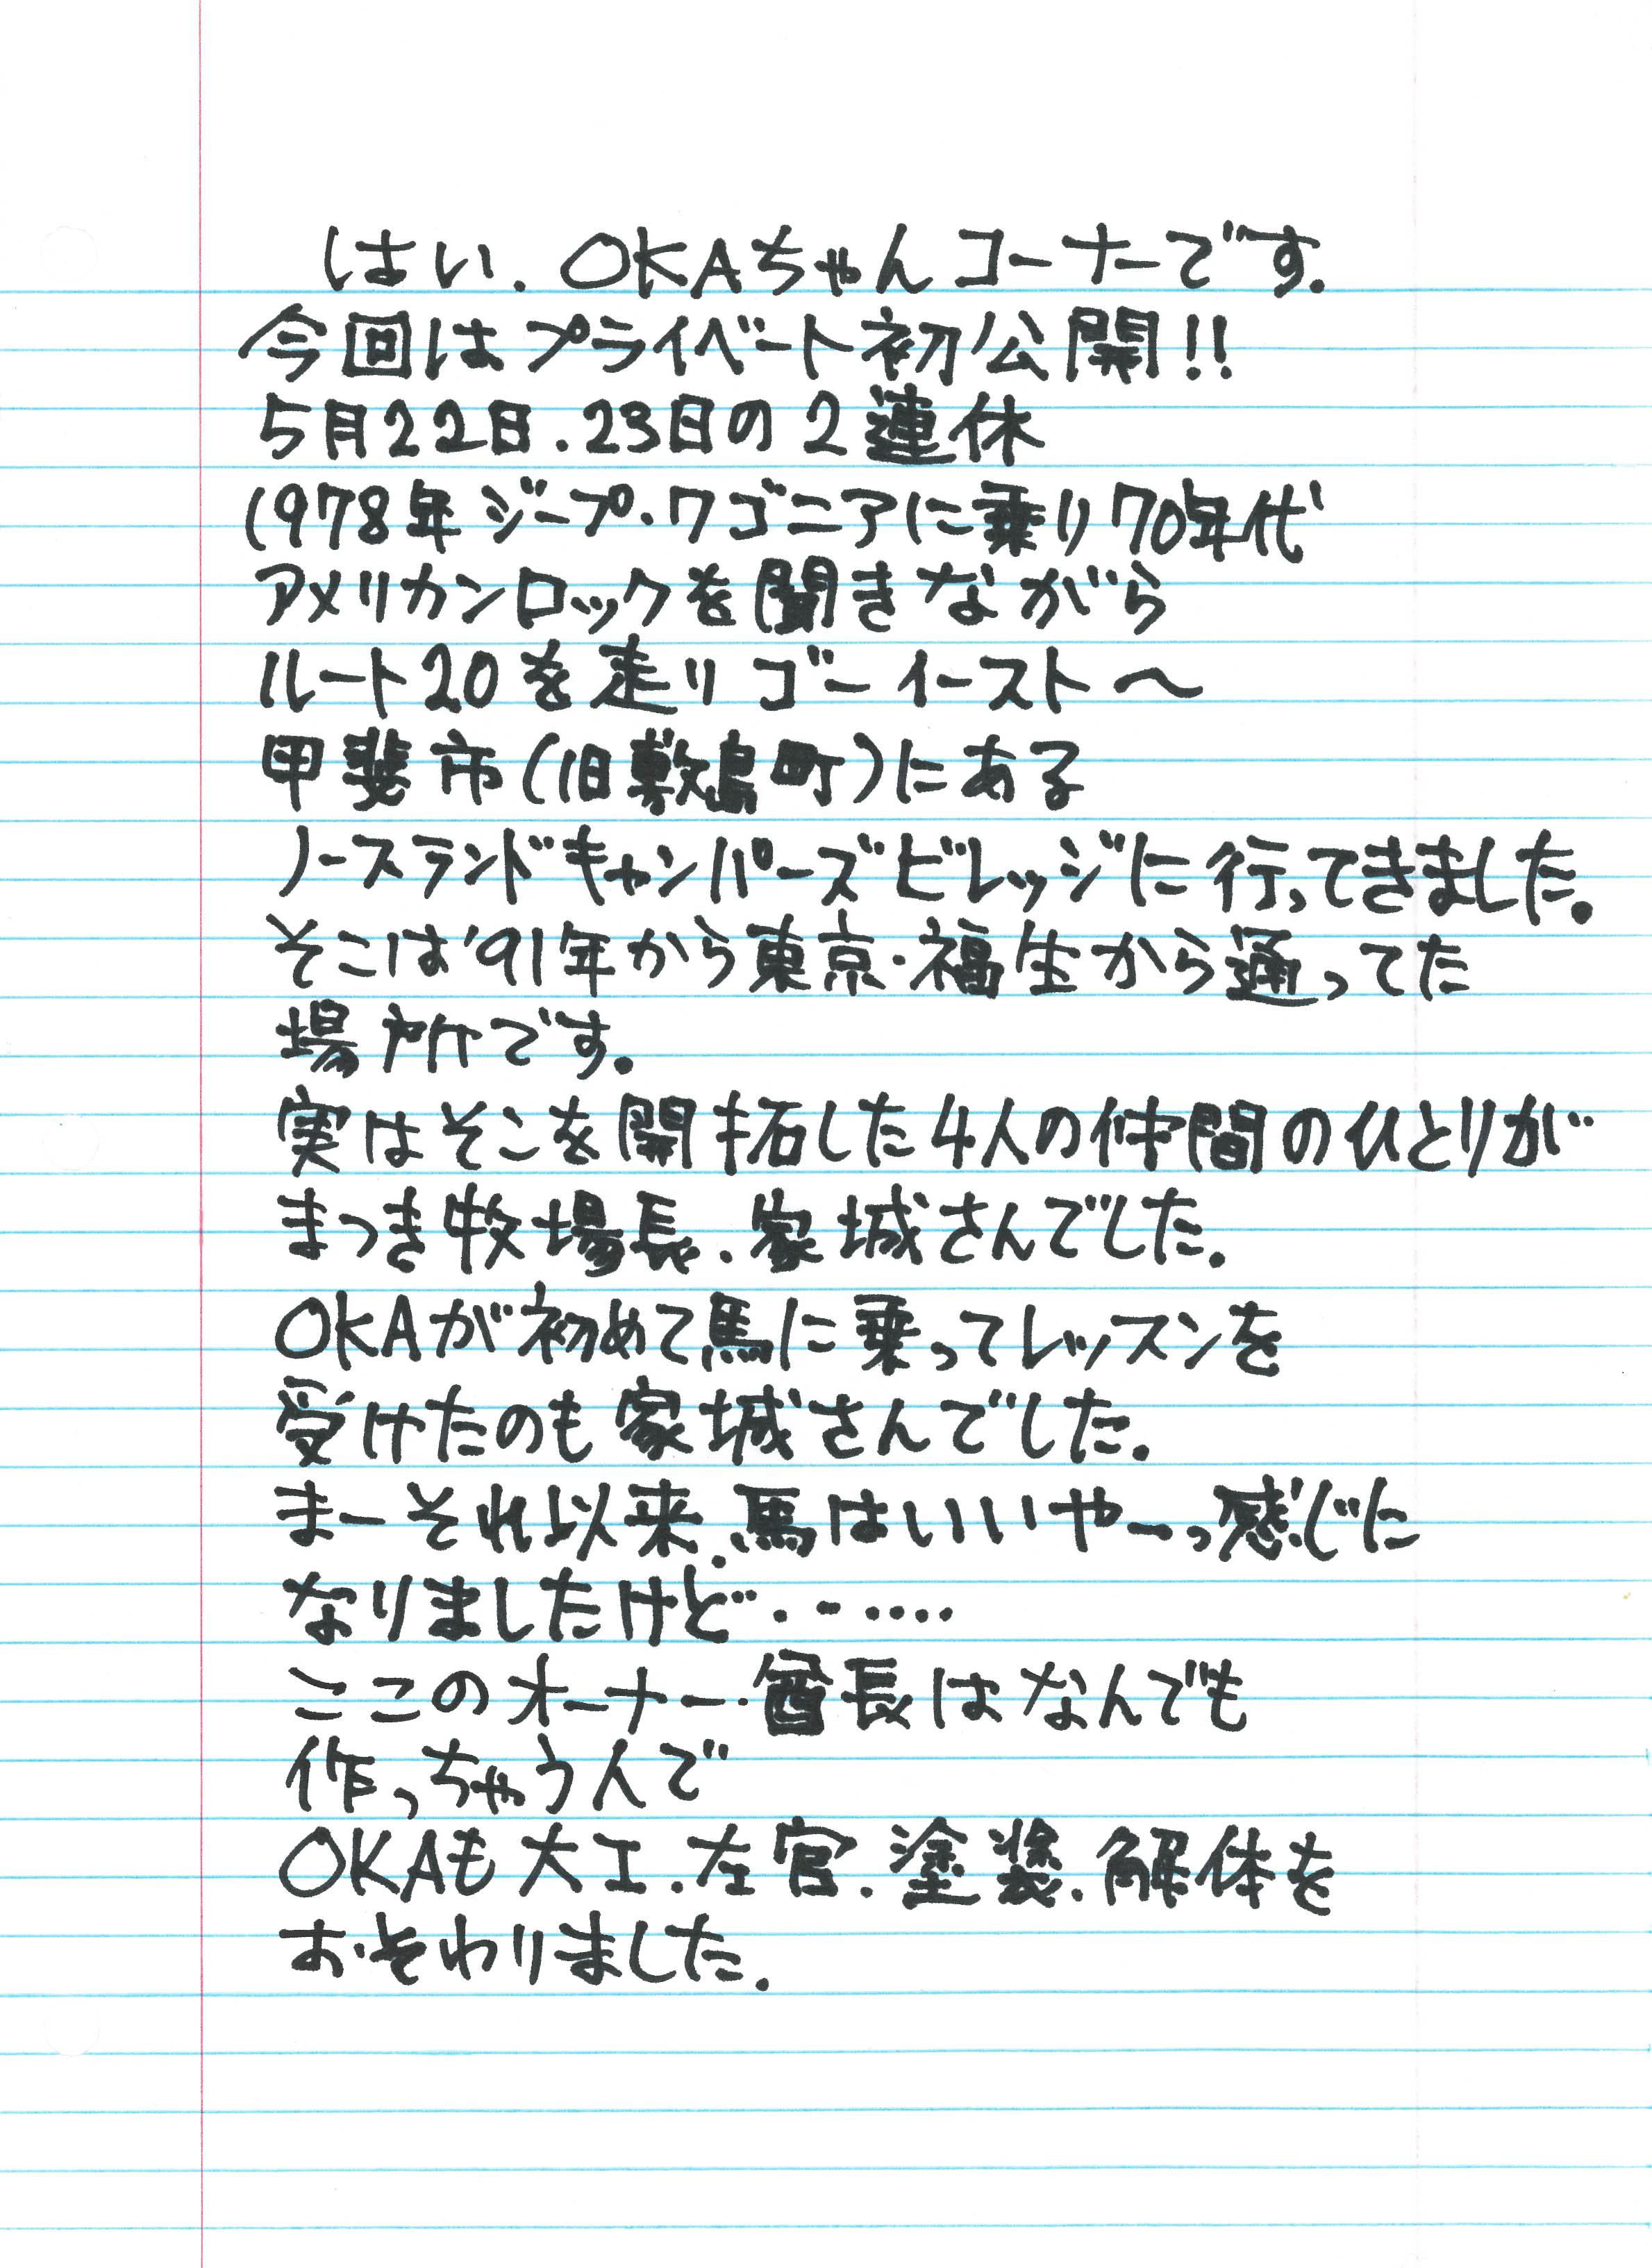 OKAちゃんのセカンドハウス公開